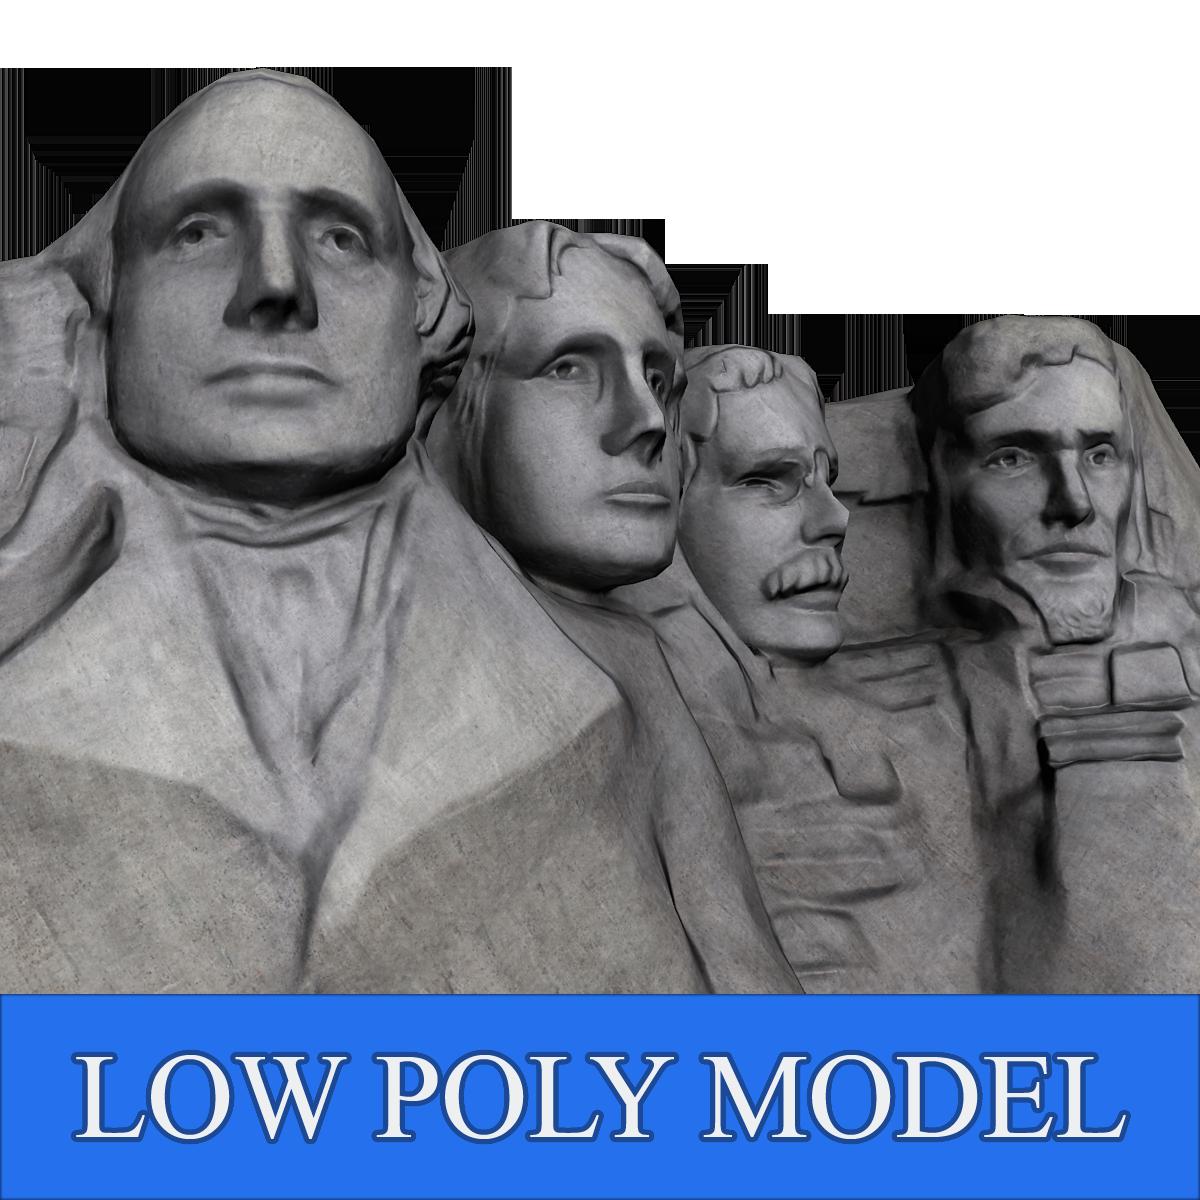 Mount Rushmore Low Poly